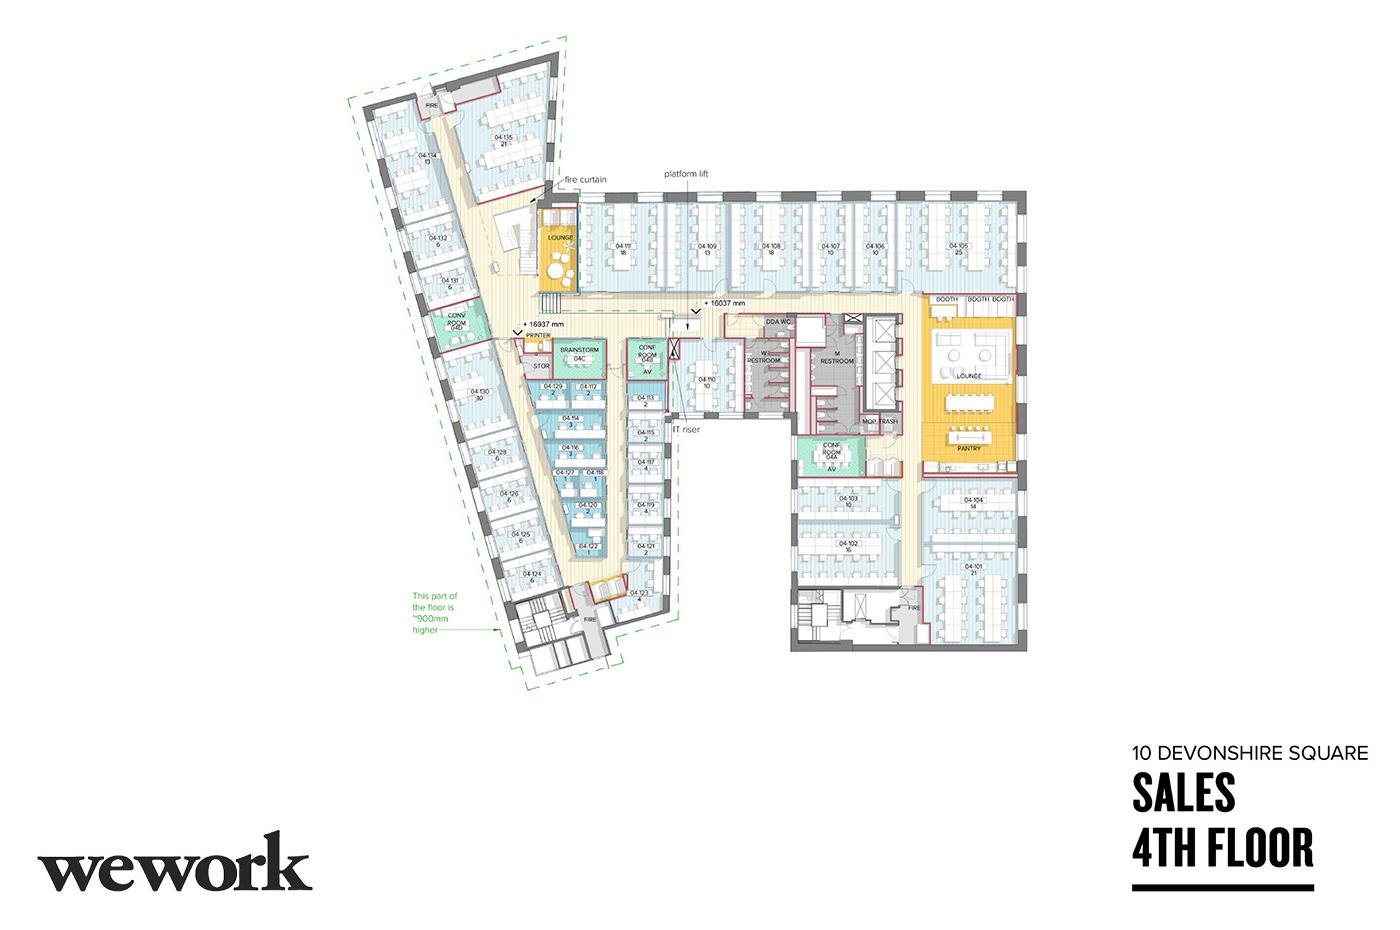 floorplans-16 copy.jpg